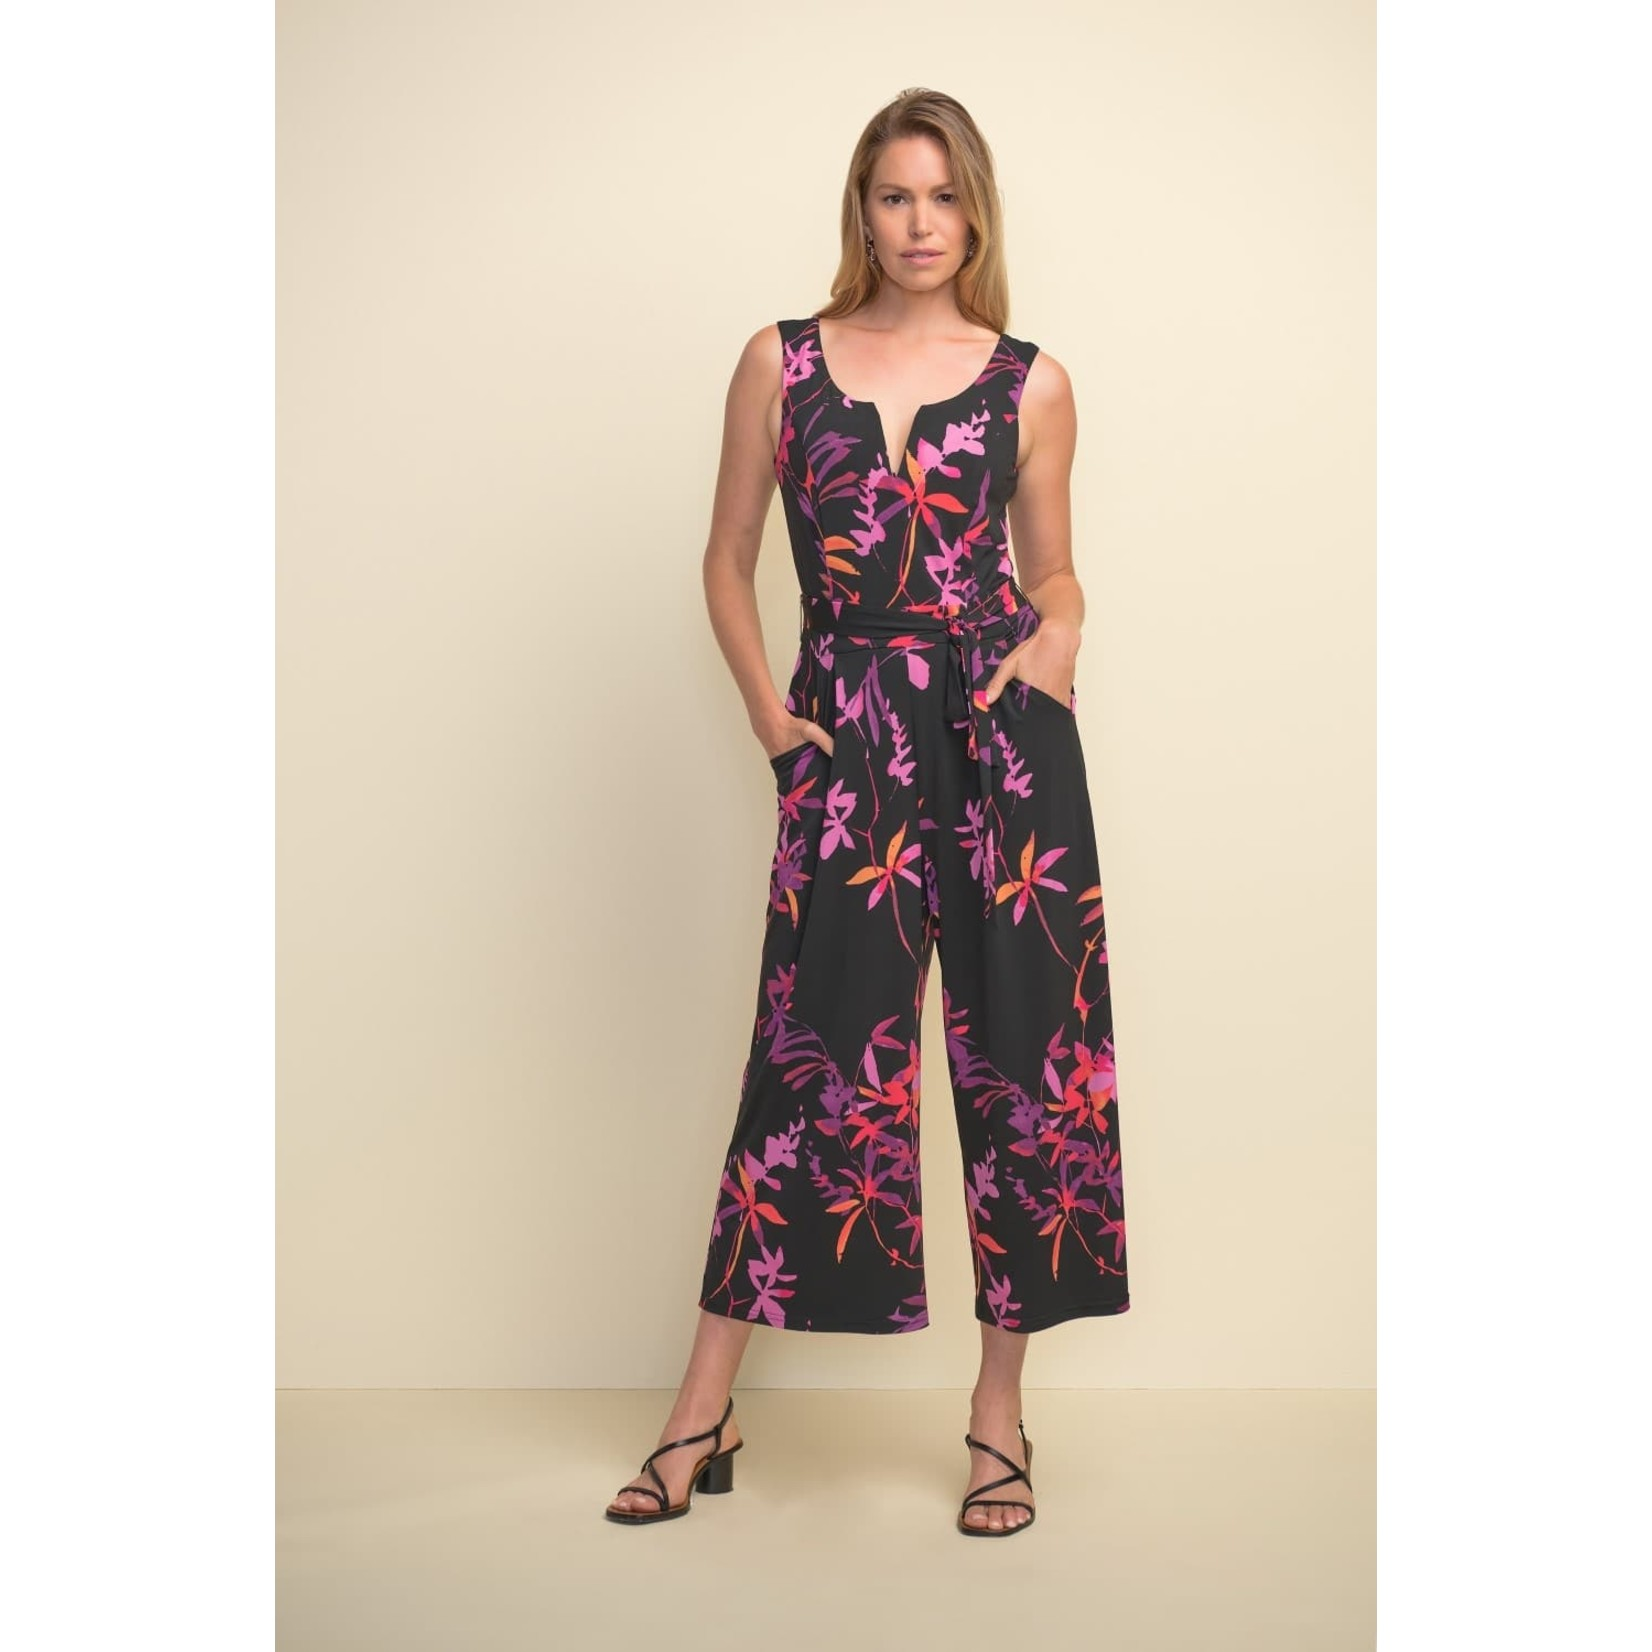 Joseph Ribkoff Floral Jumpsuit 21112